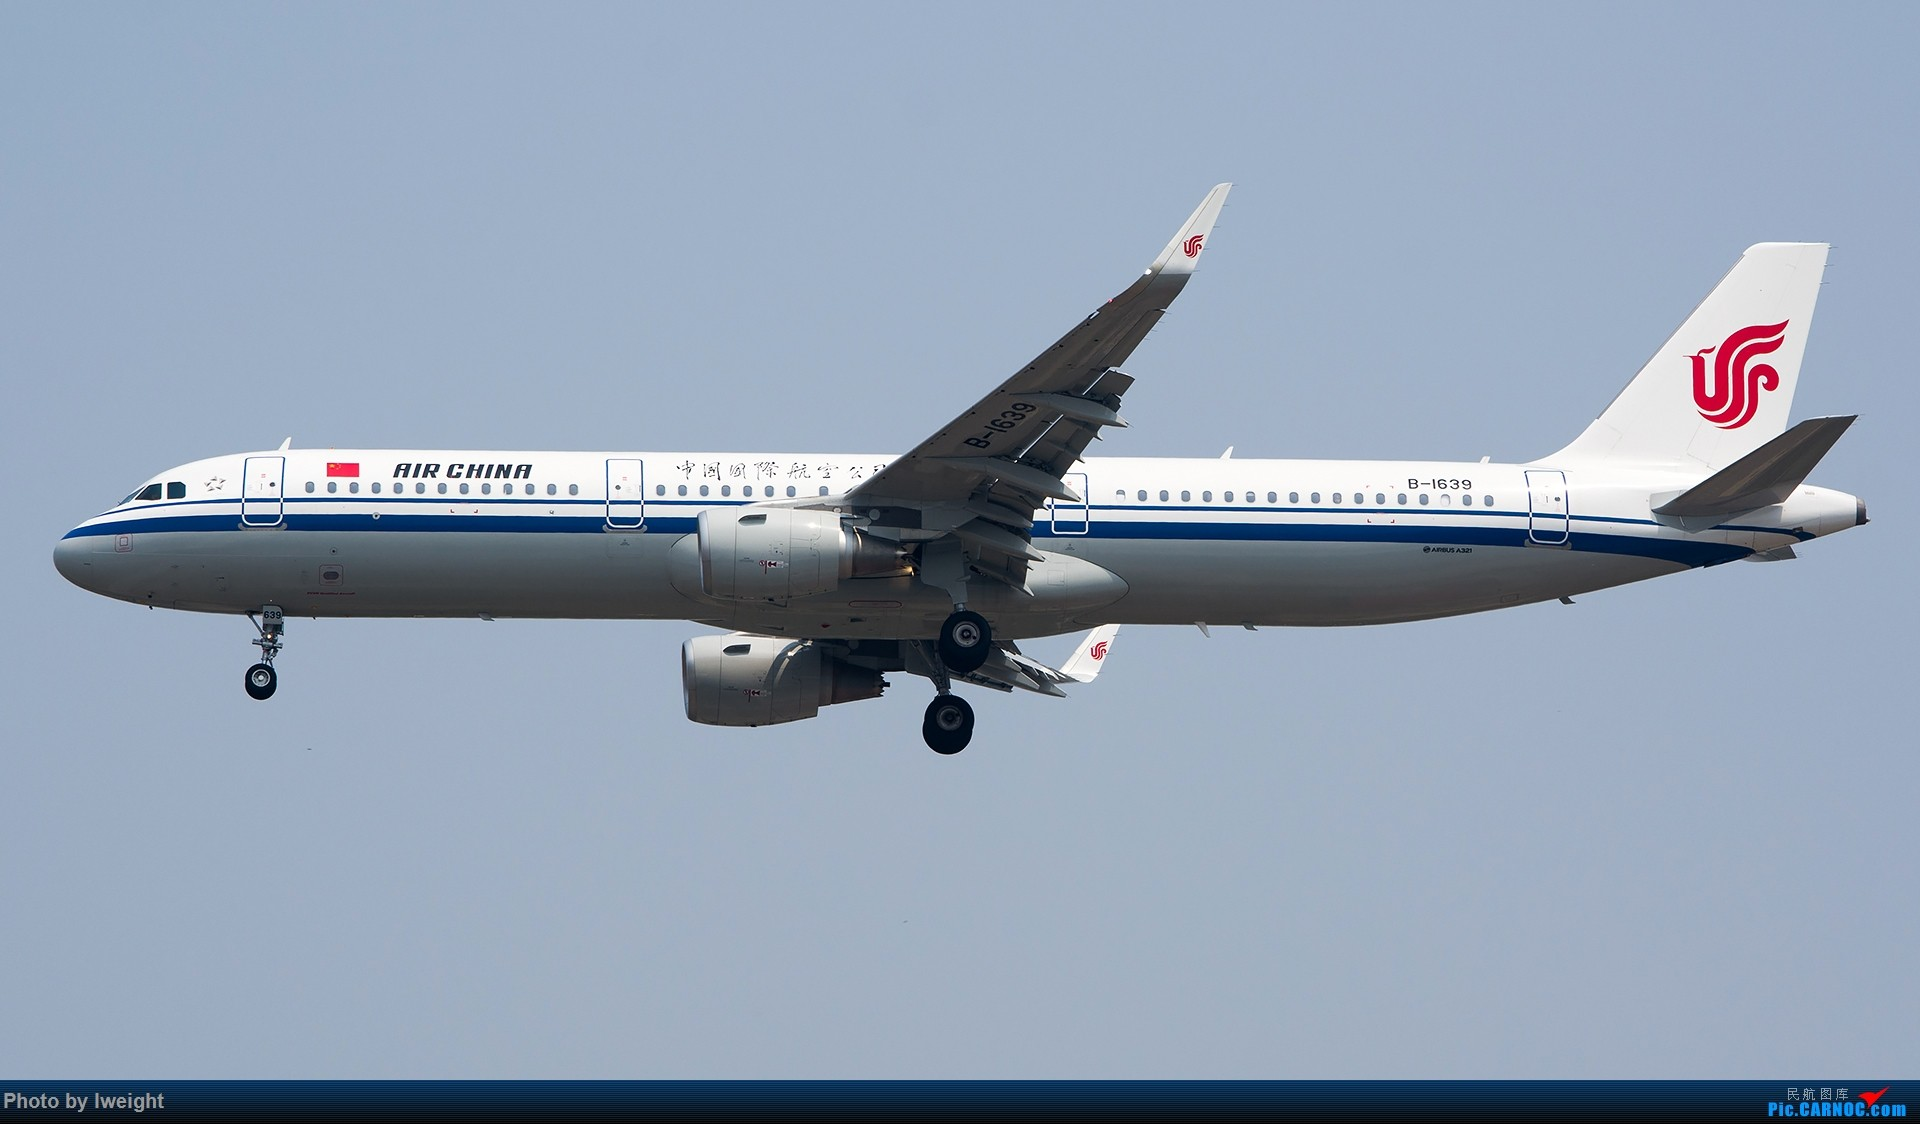 Re:[原创]周末帝都霾天拍机,凑合看看吧【2015-5-23】 AIRBUS A321-200 B-1639 中国北京首都国际机场